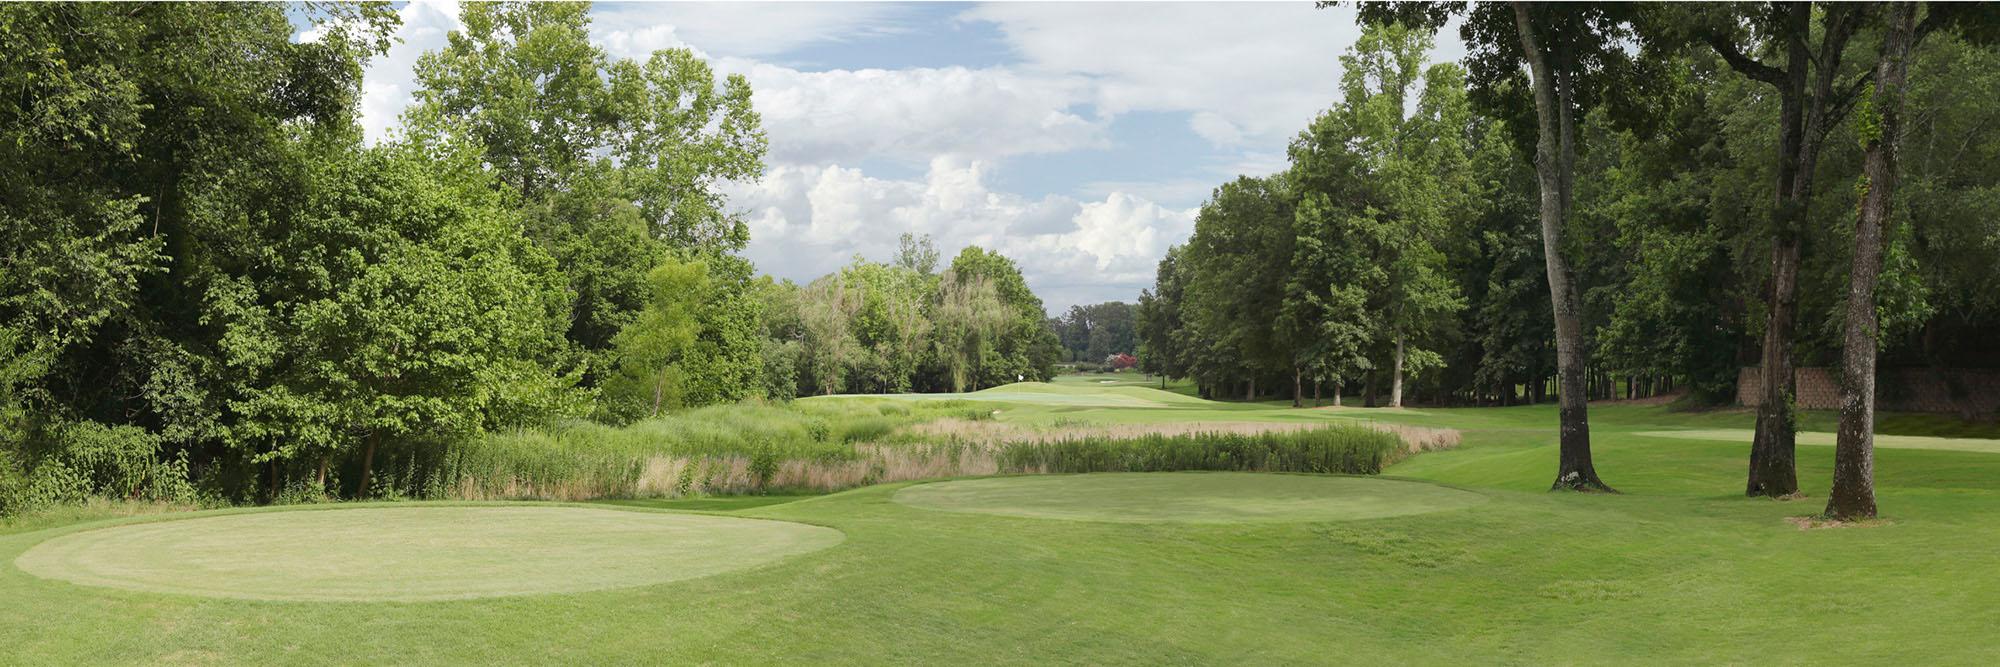 Golf Course Image - River Run Country Club No. 8